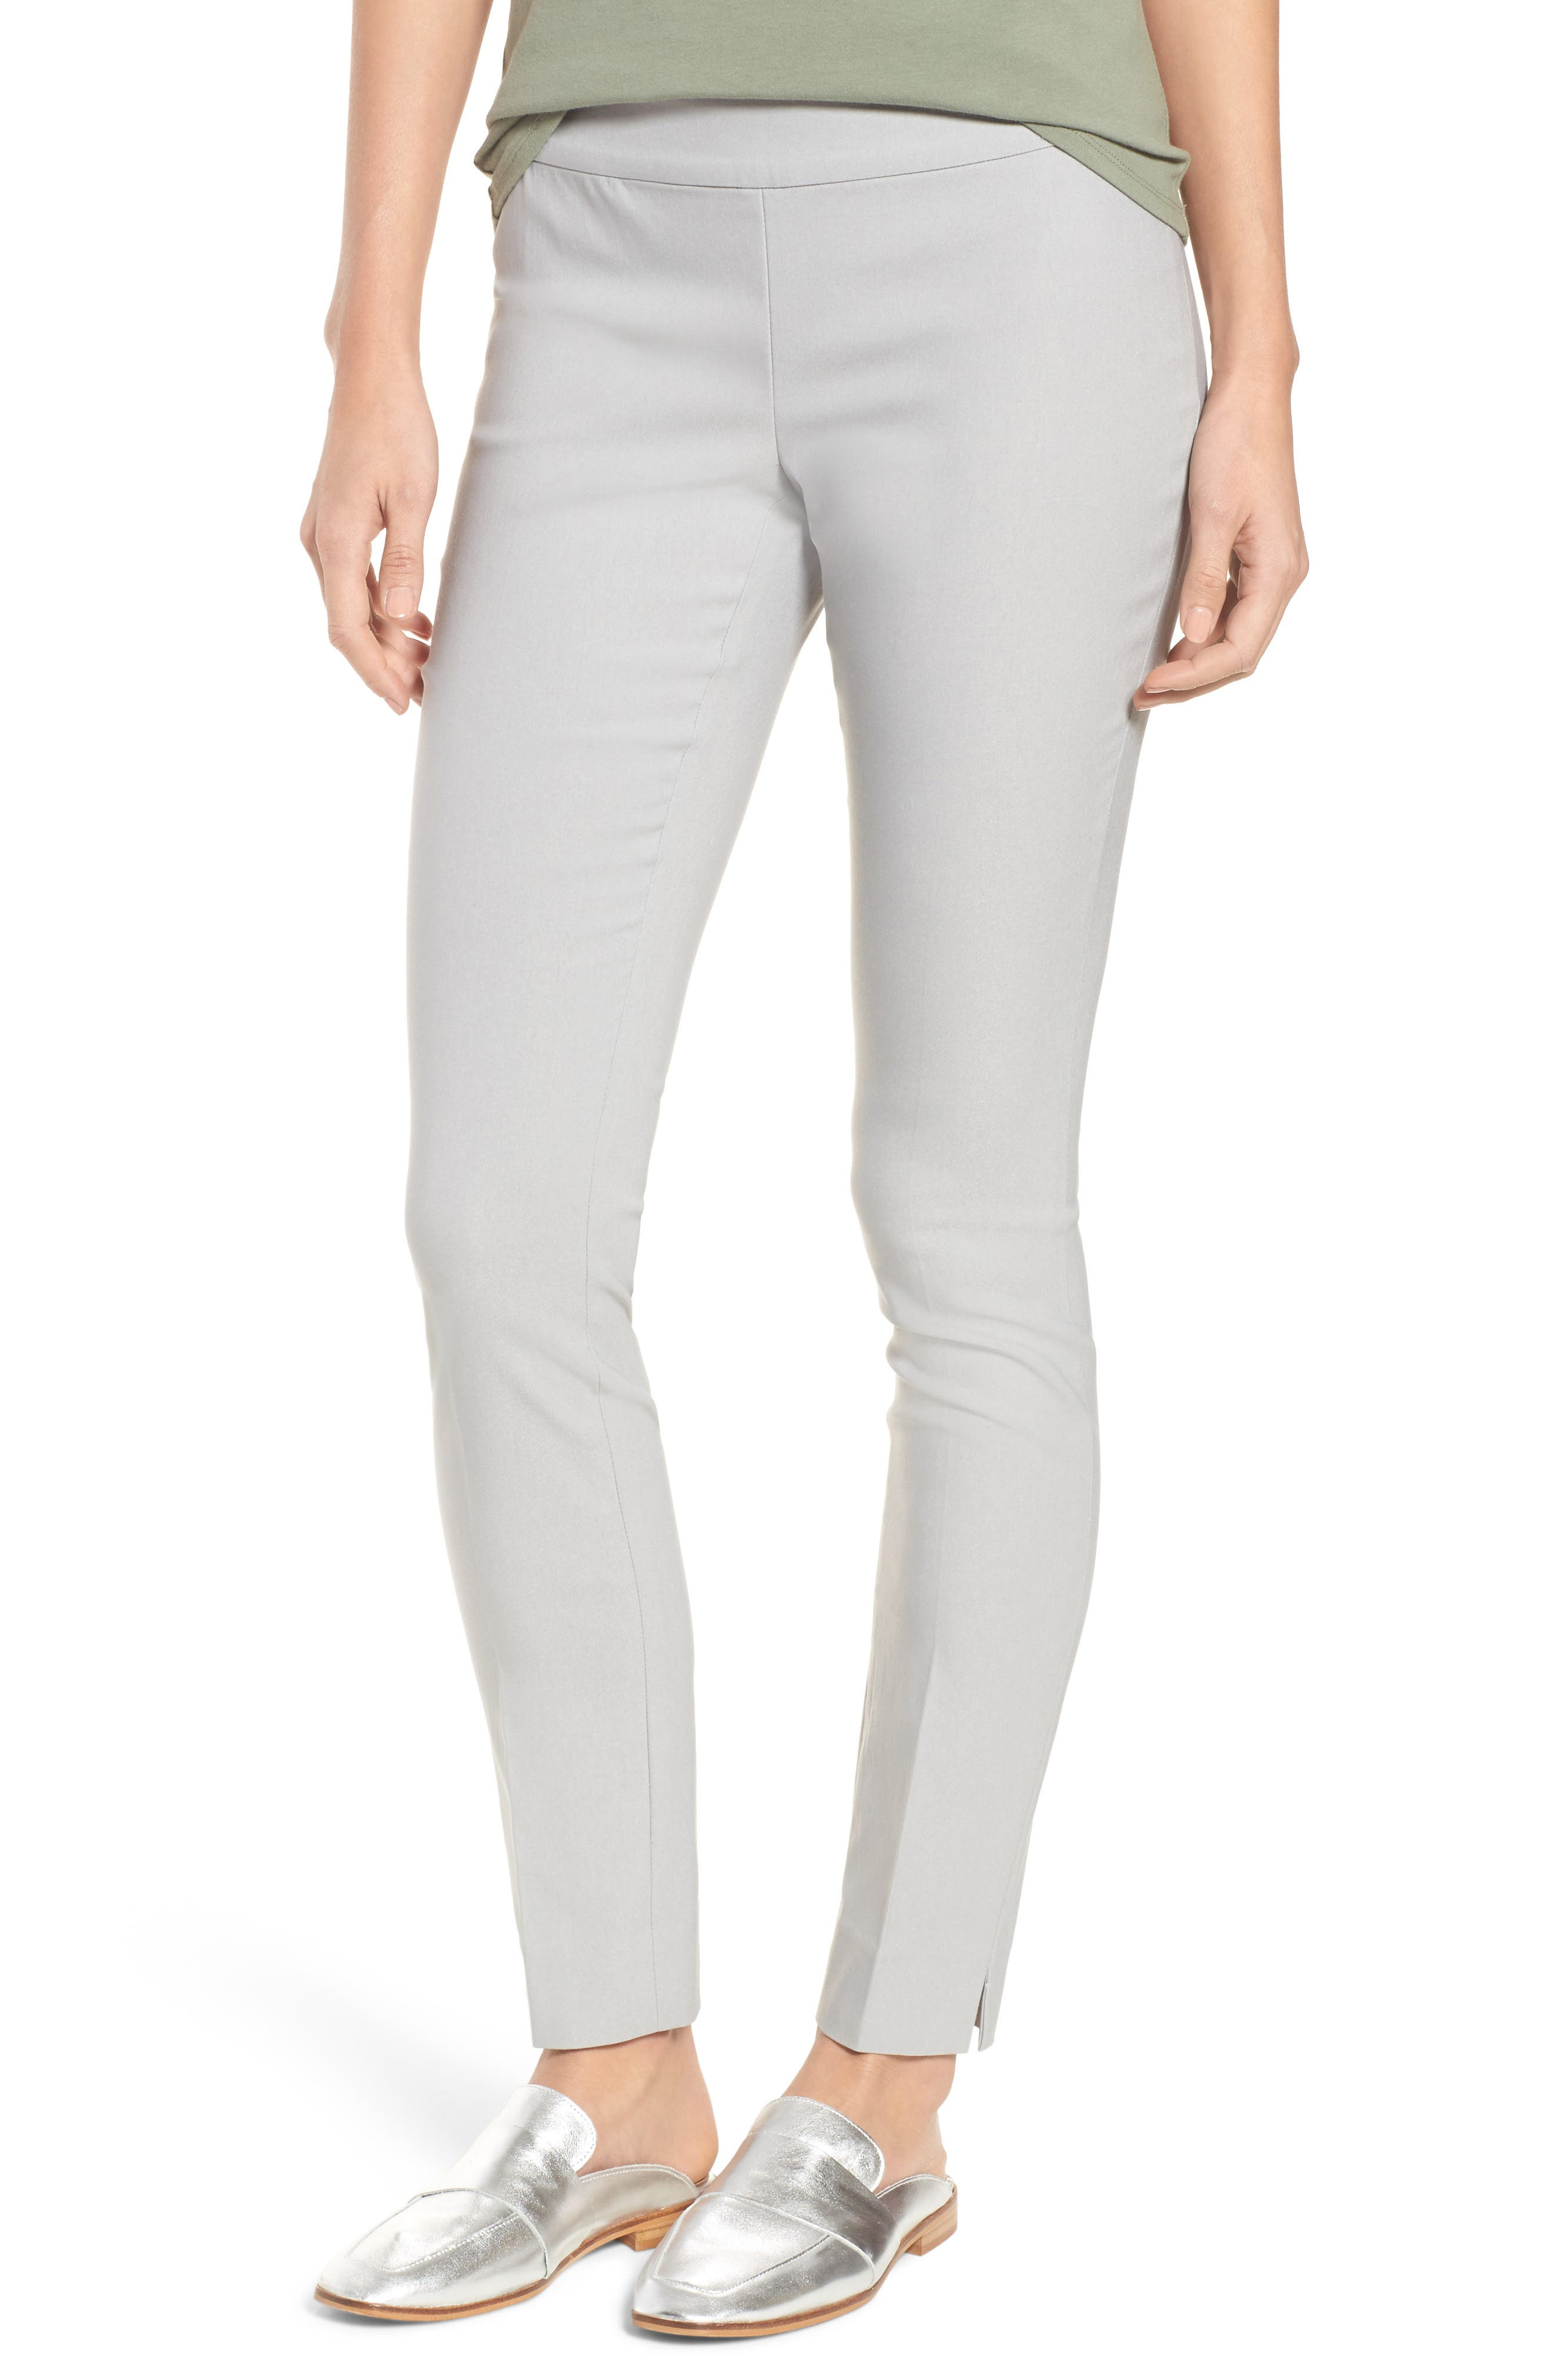 NIC + ZOE Wonderstretch Slim Pants,                         Main,                         color, 050